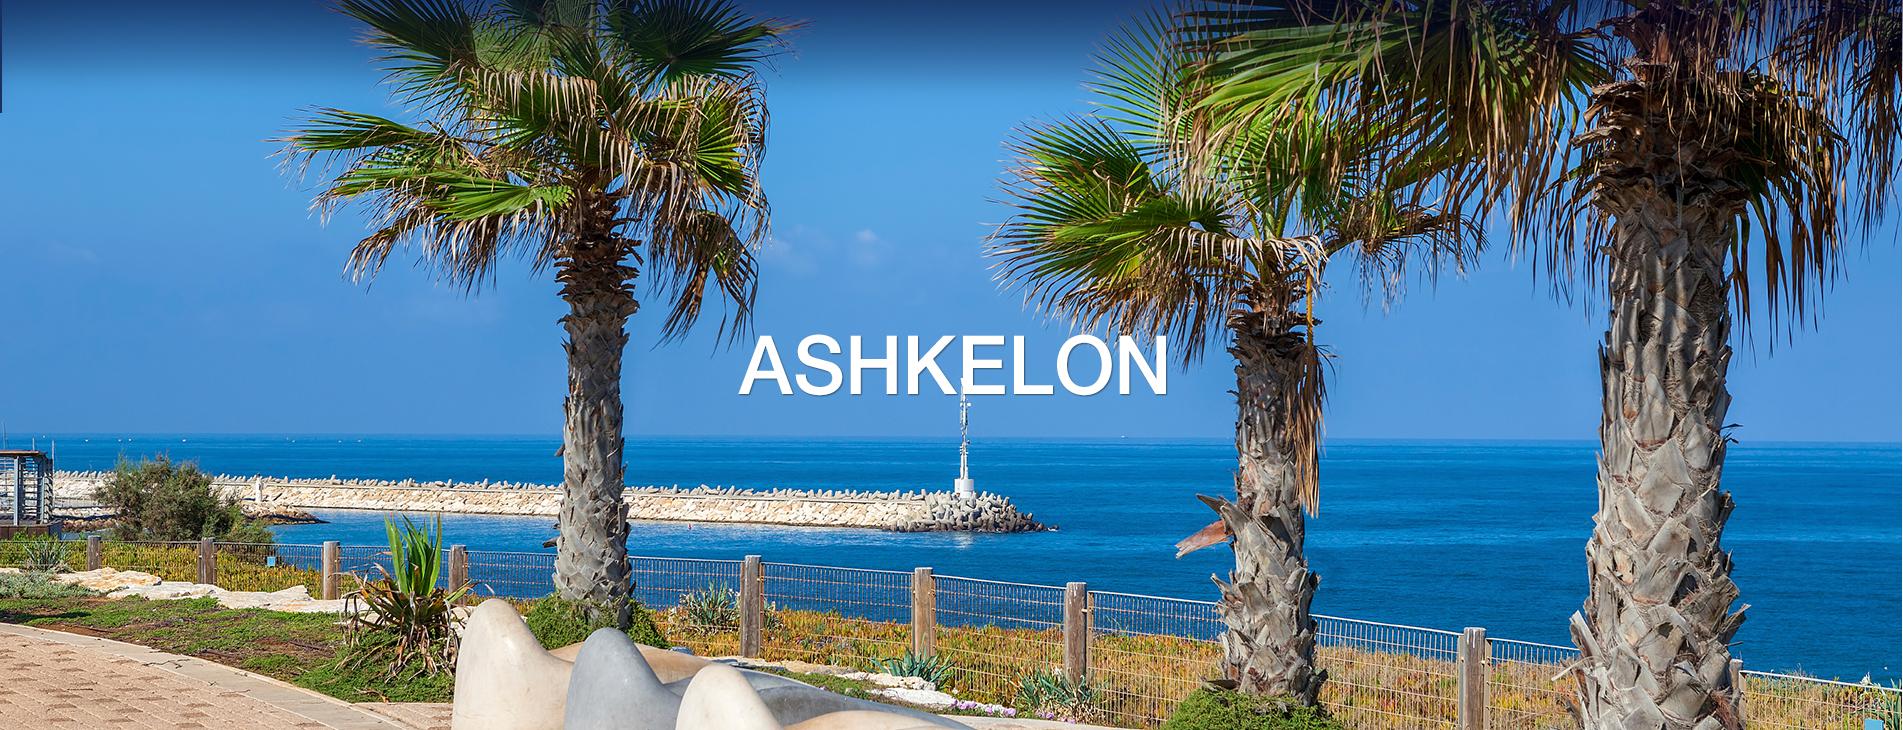 Ashkelon1